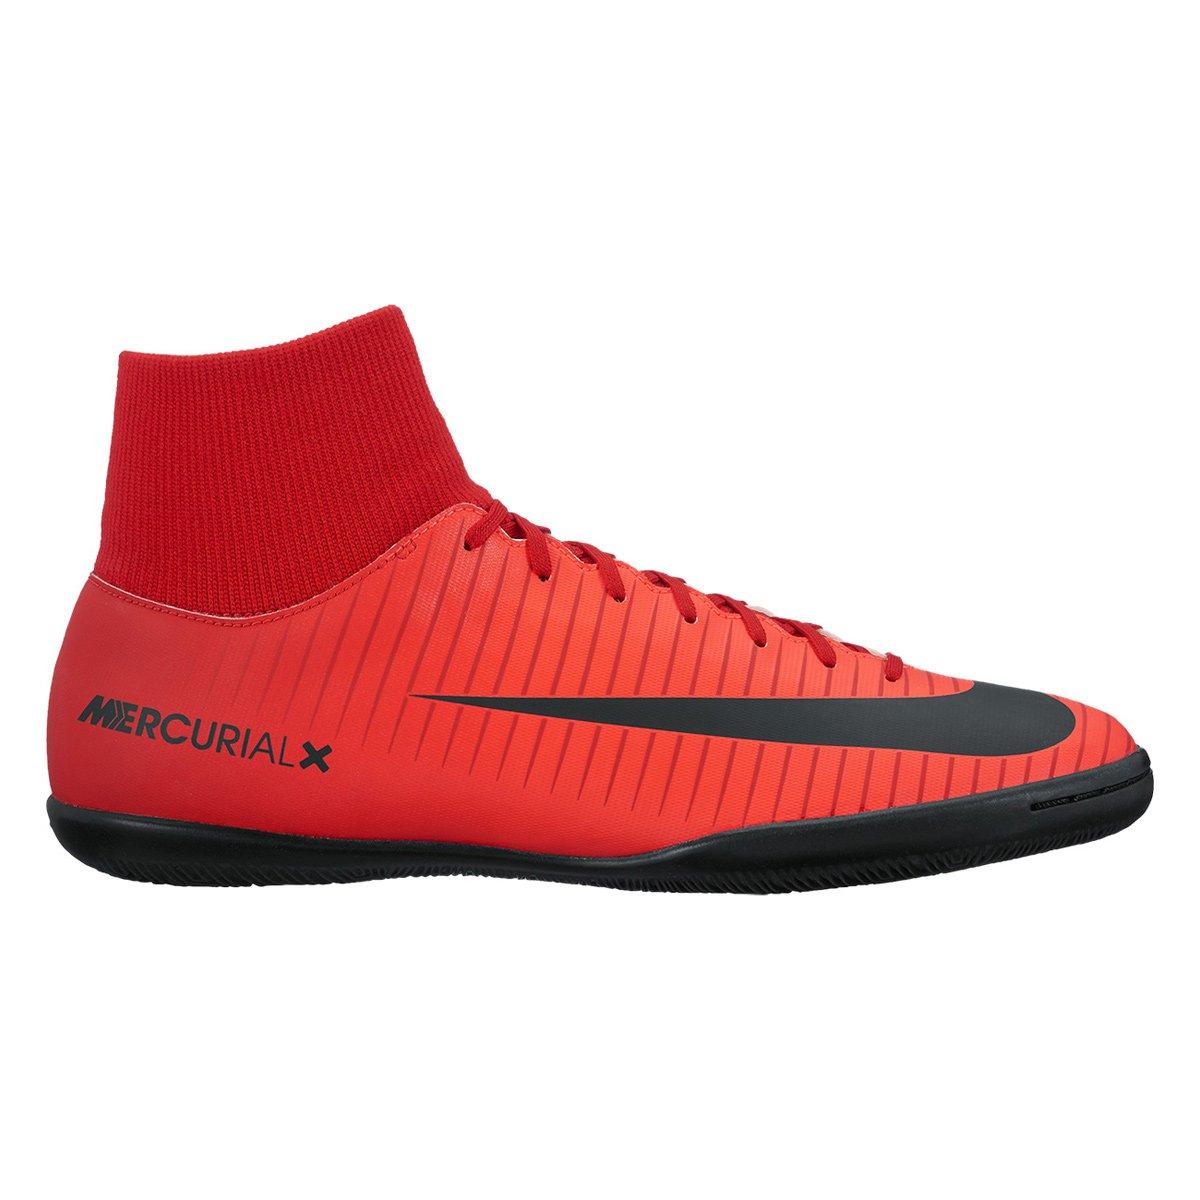 Chuteira Futsal Nike Mercurial Victory 6 DF IC - Vermelho e Preto ... 7e4924500ffb7